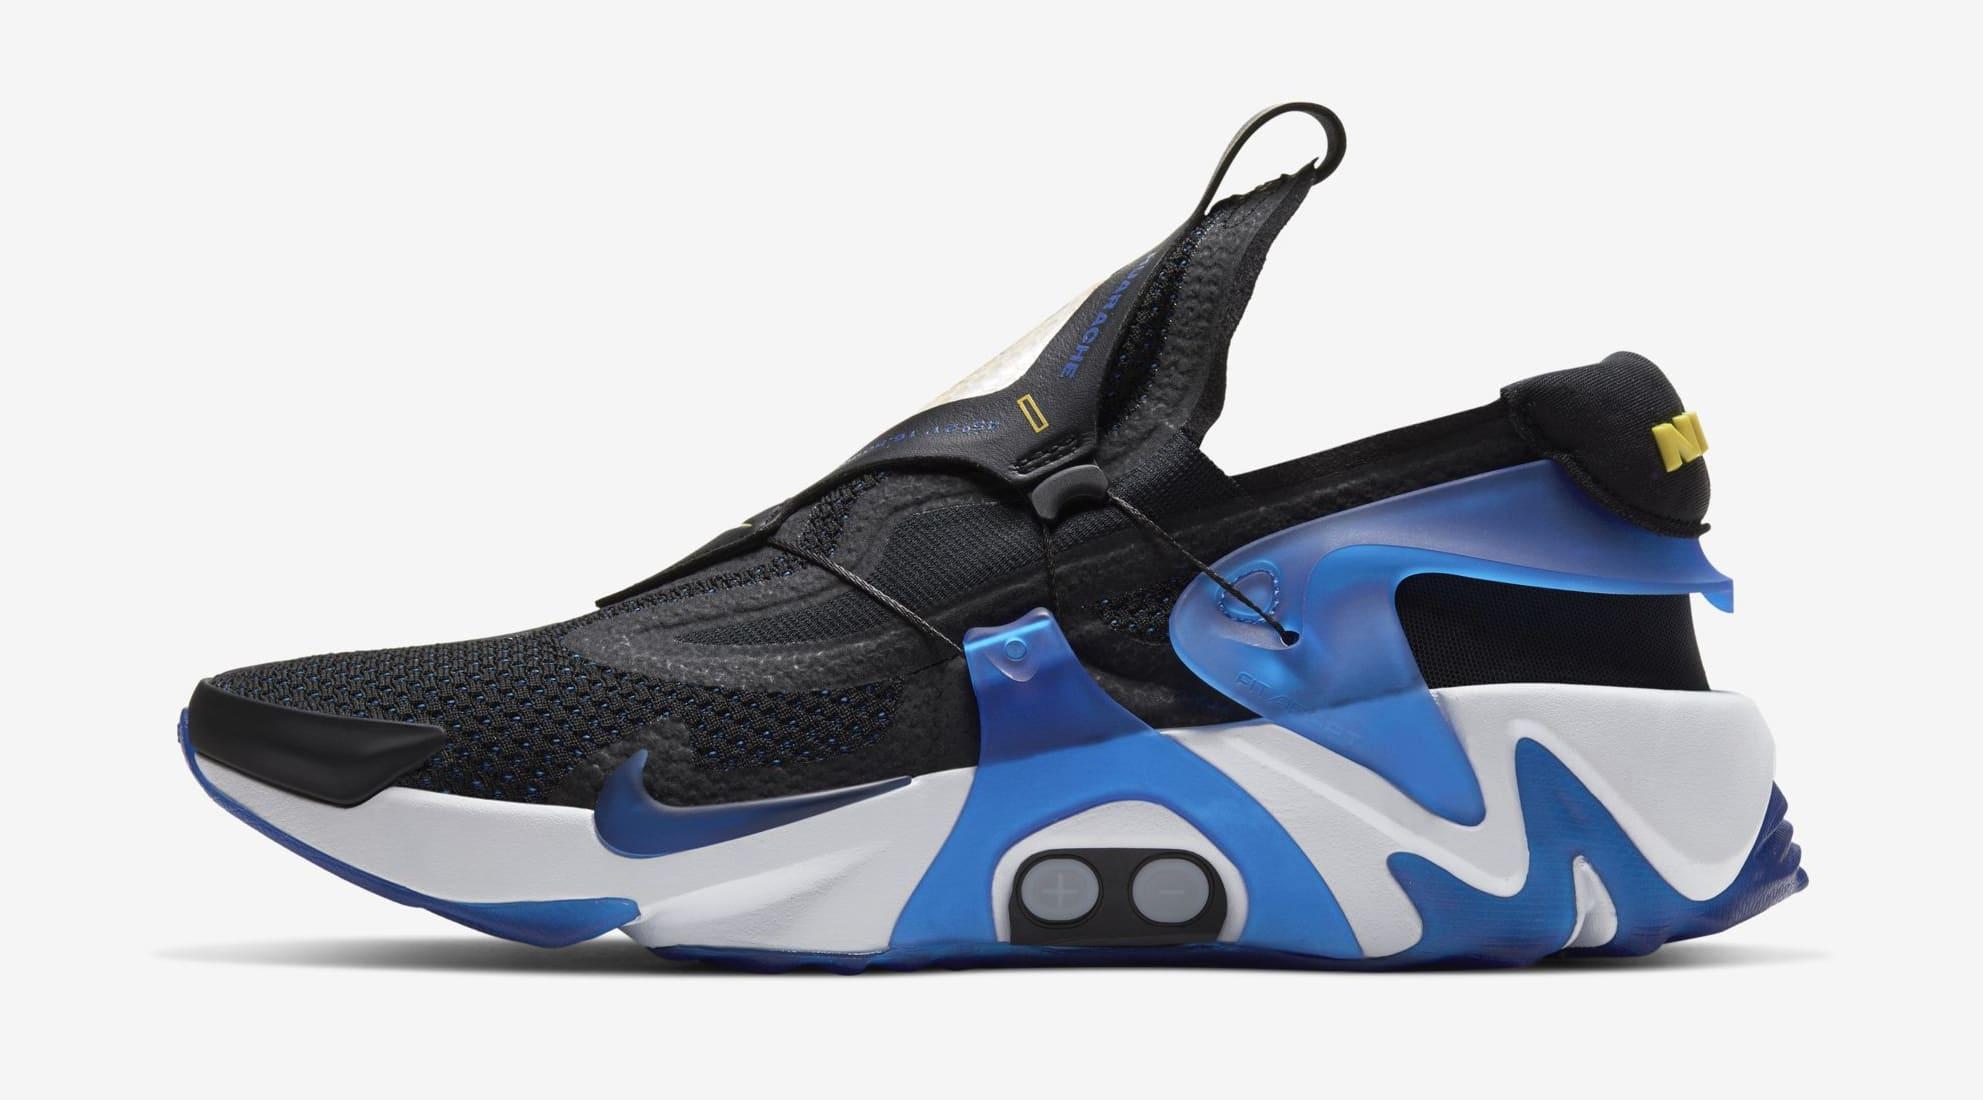 Nike Adapt Huarache 'Black/Racer Blue' Release Date | Sole ...